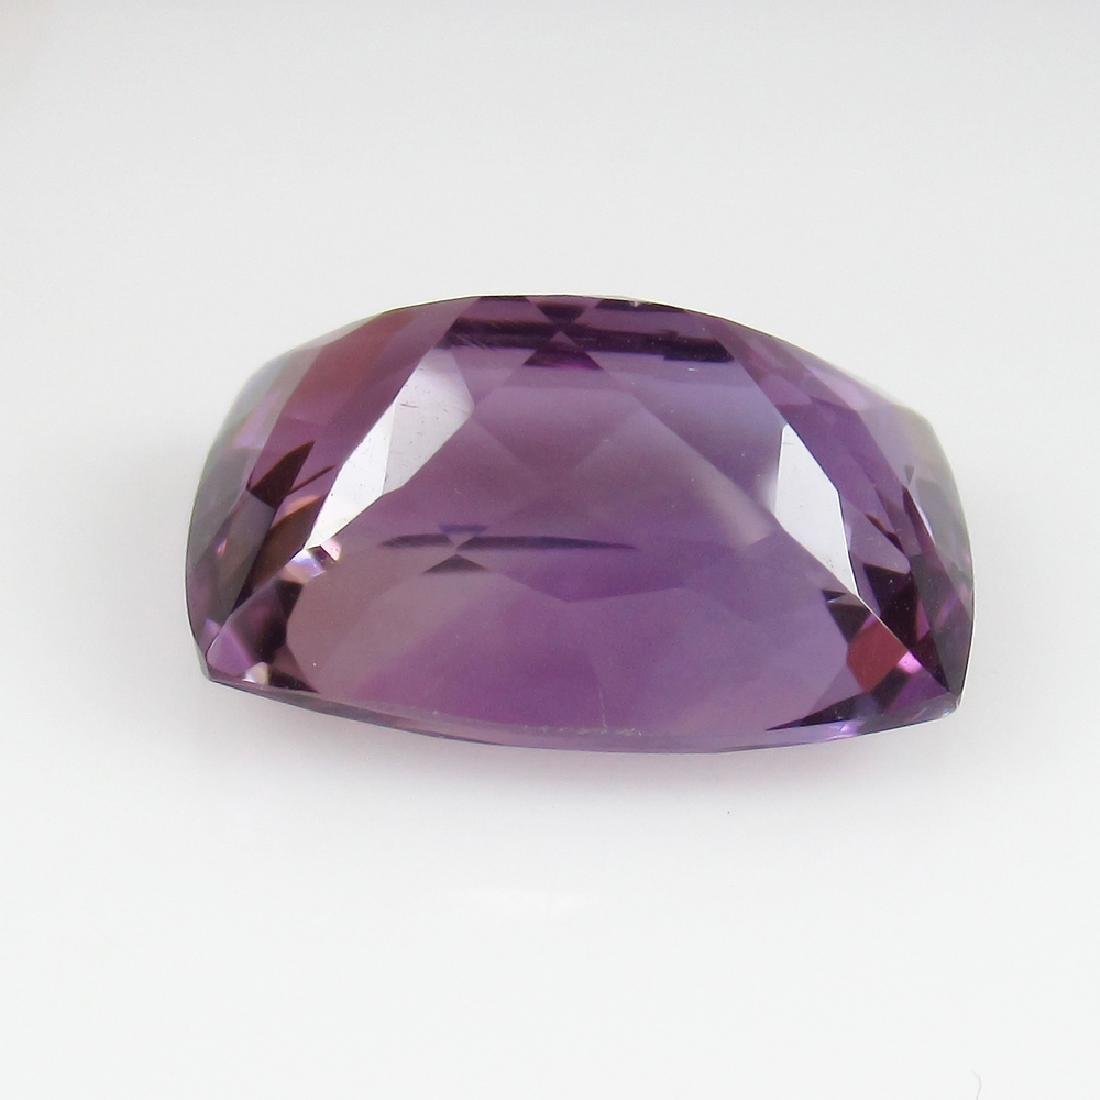 10.37 Ctw Natural Purple Amethyst Excellent Cushion Cut - 2